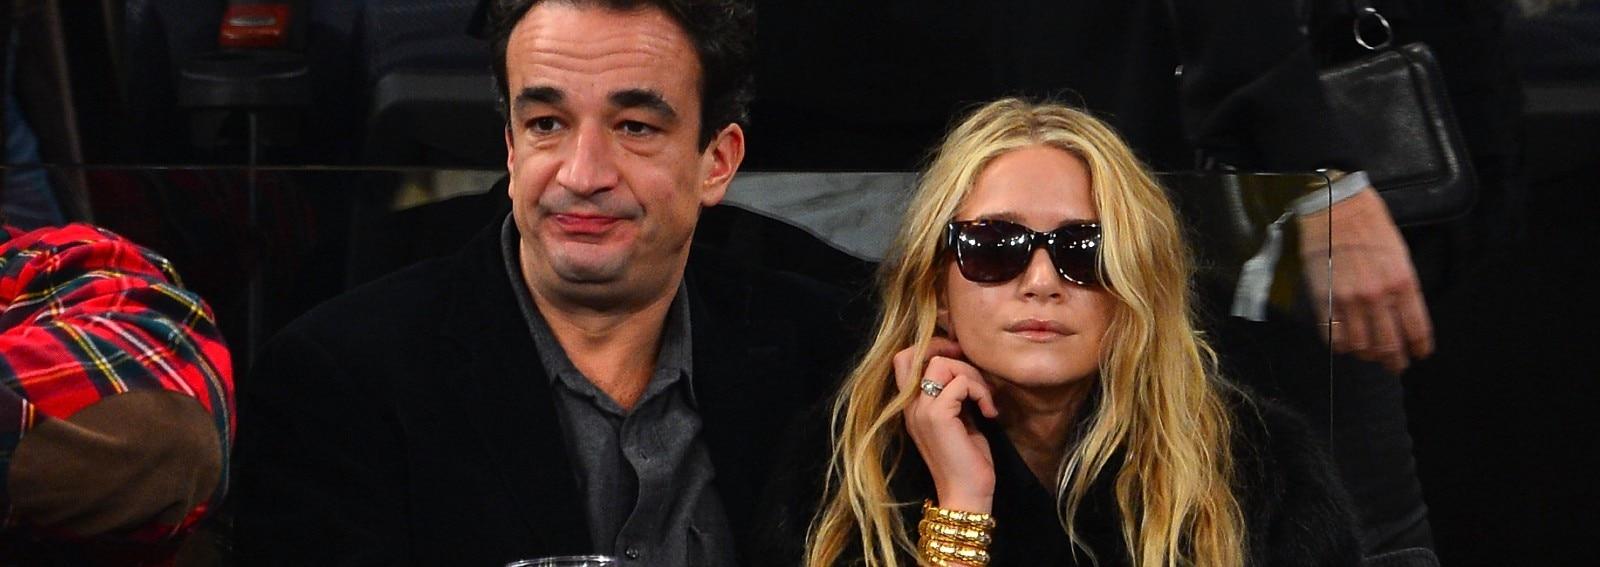 Mary-Kate Olsen e Olivier Sarkozy (1)